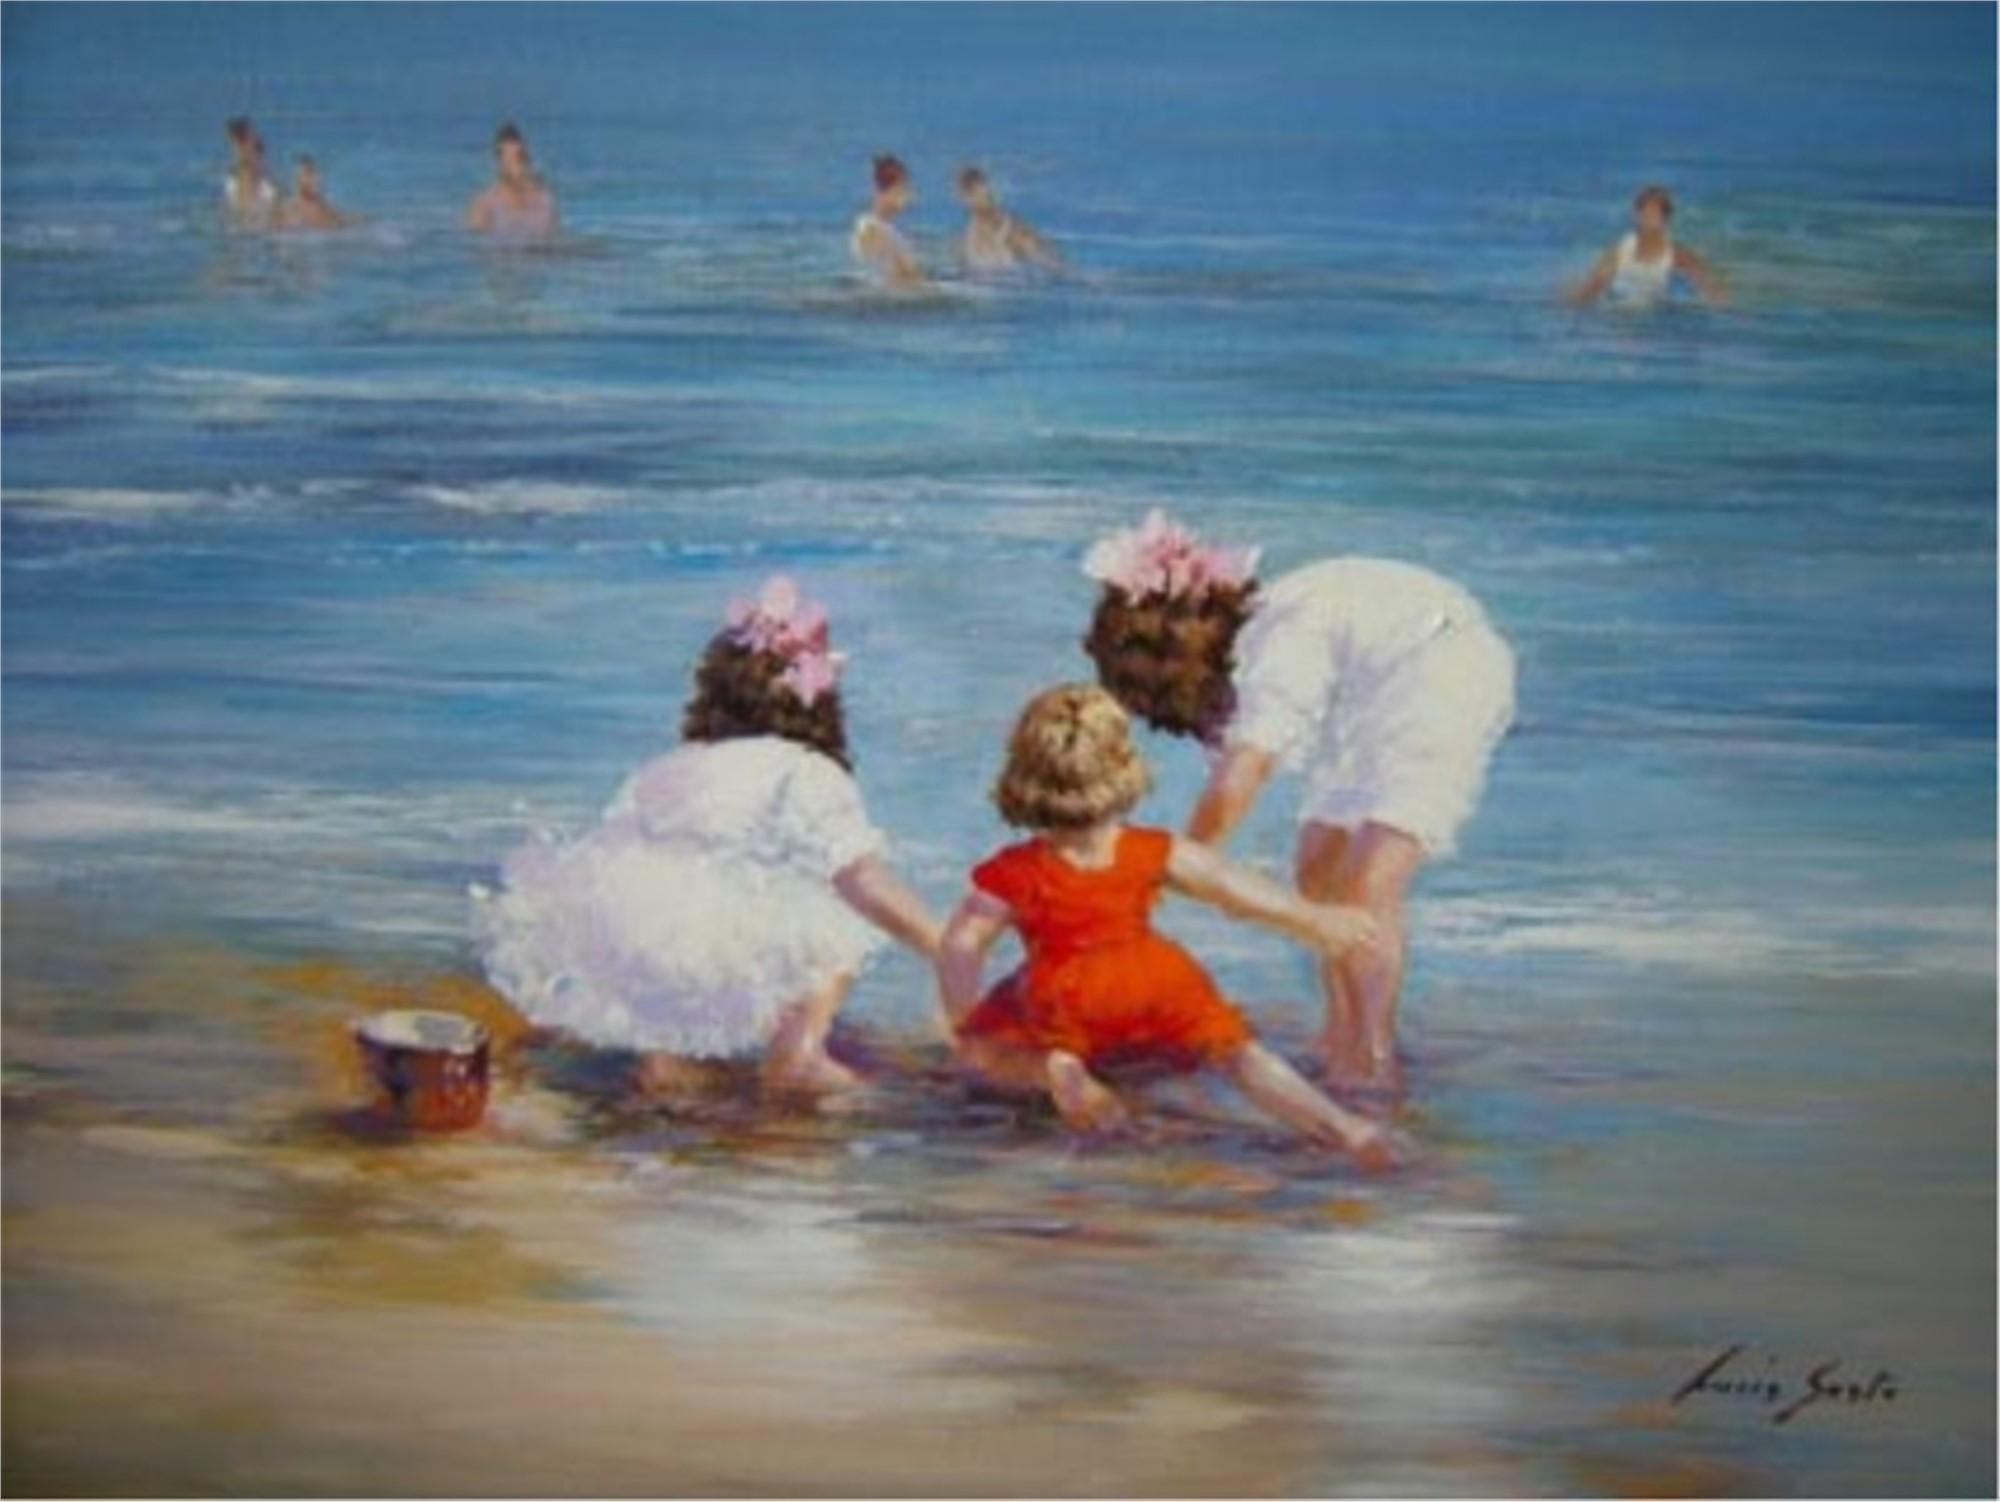 On the Beach by Lucia Sarto